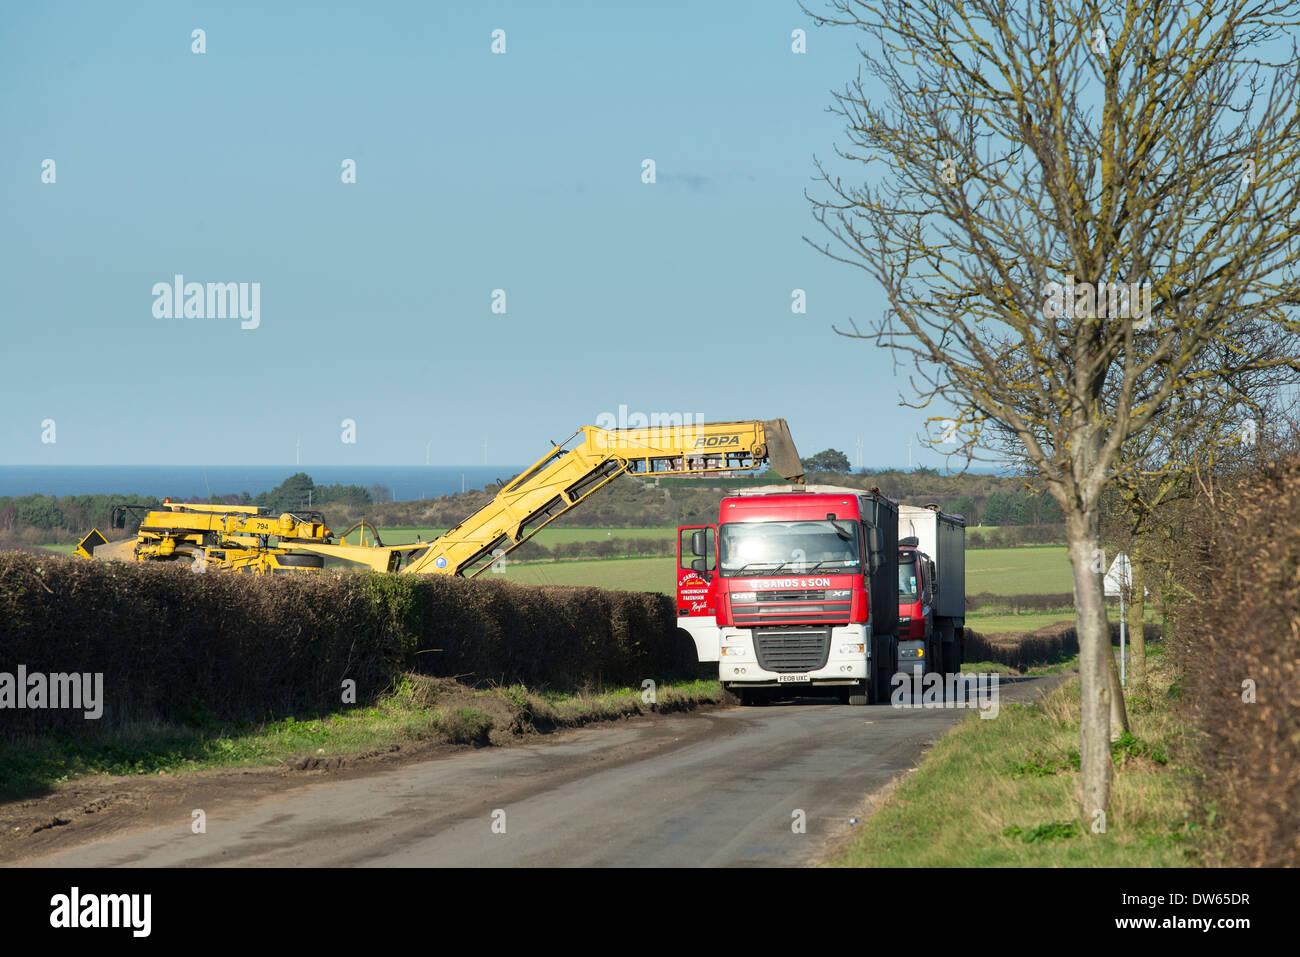 Roadside sugar beet loading, - Stock Image